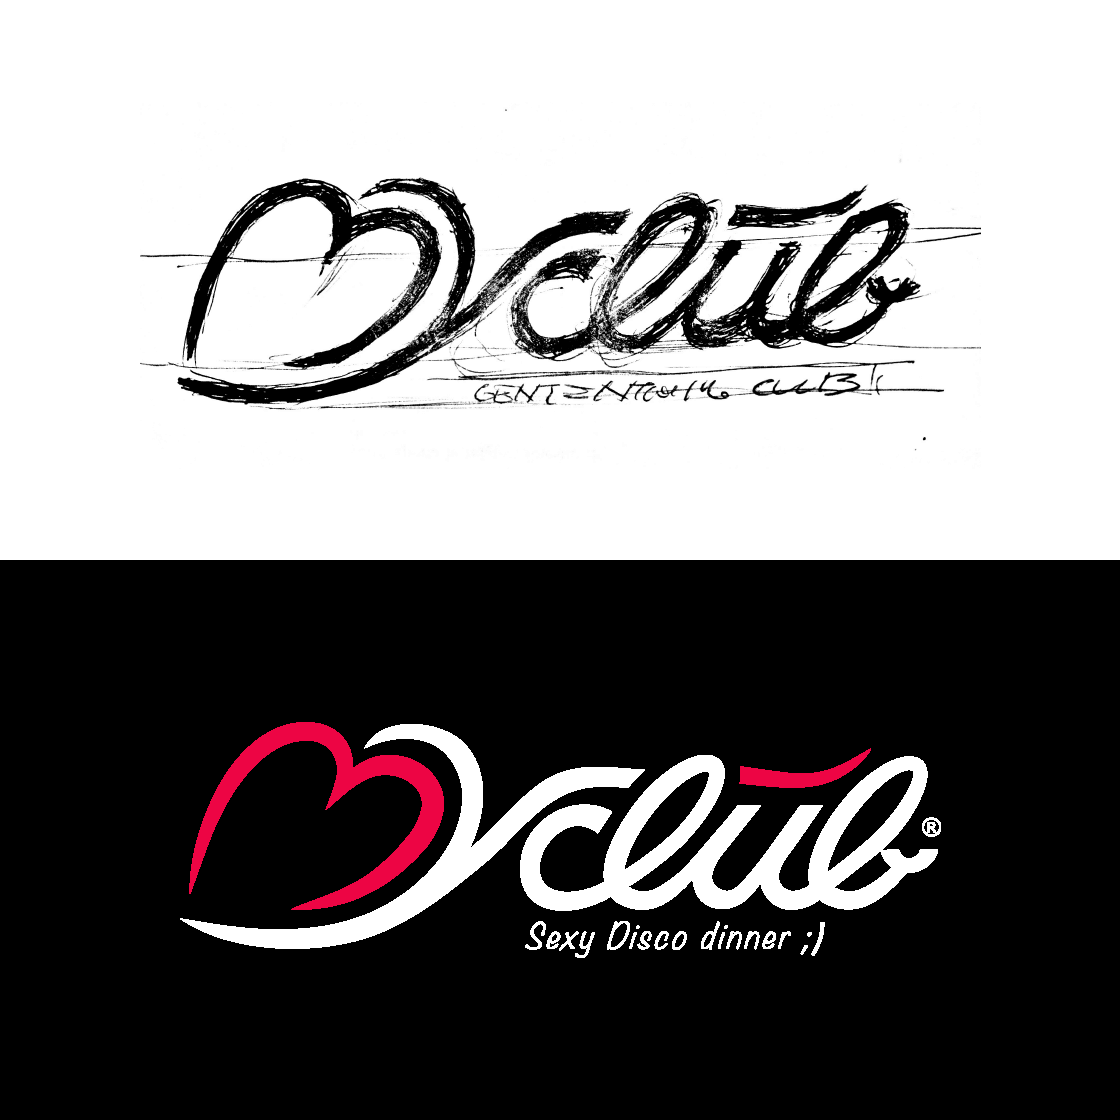 myclub-logotipo-px1120